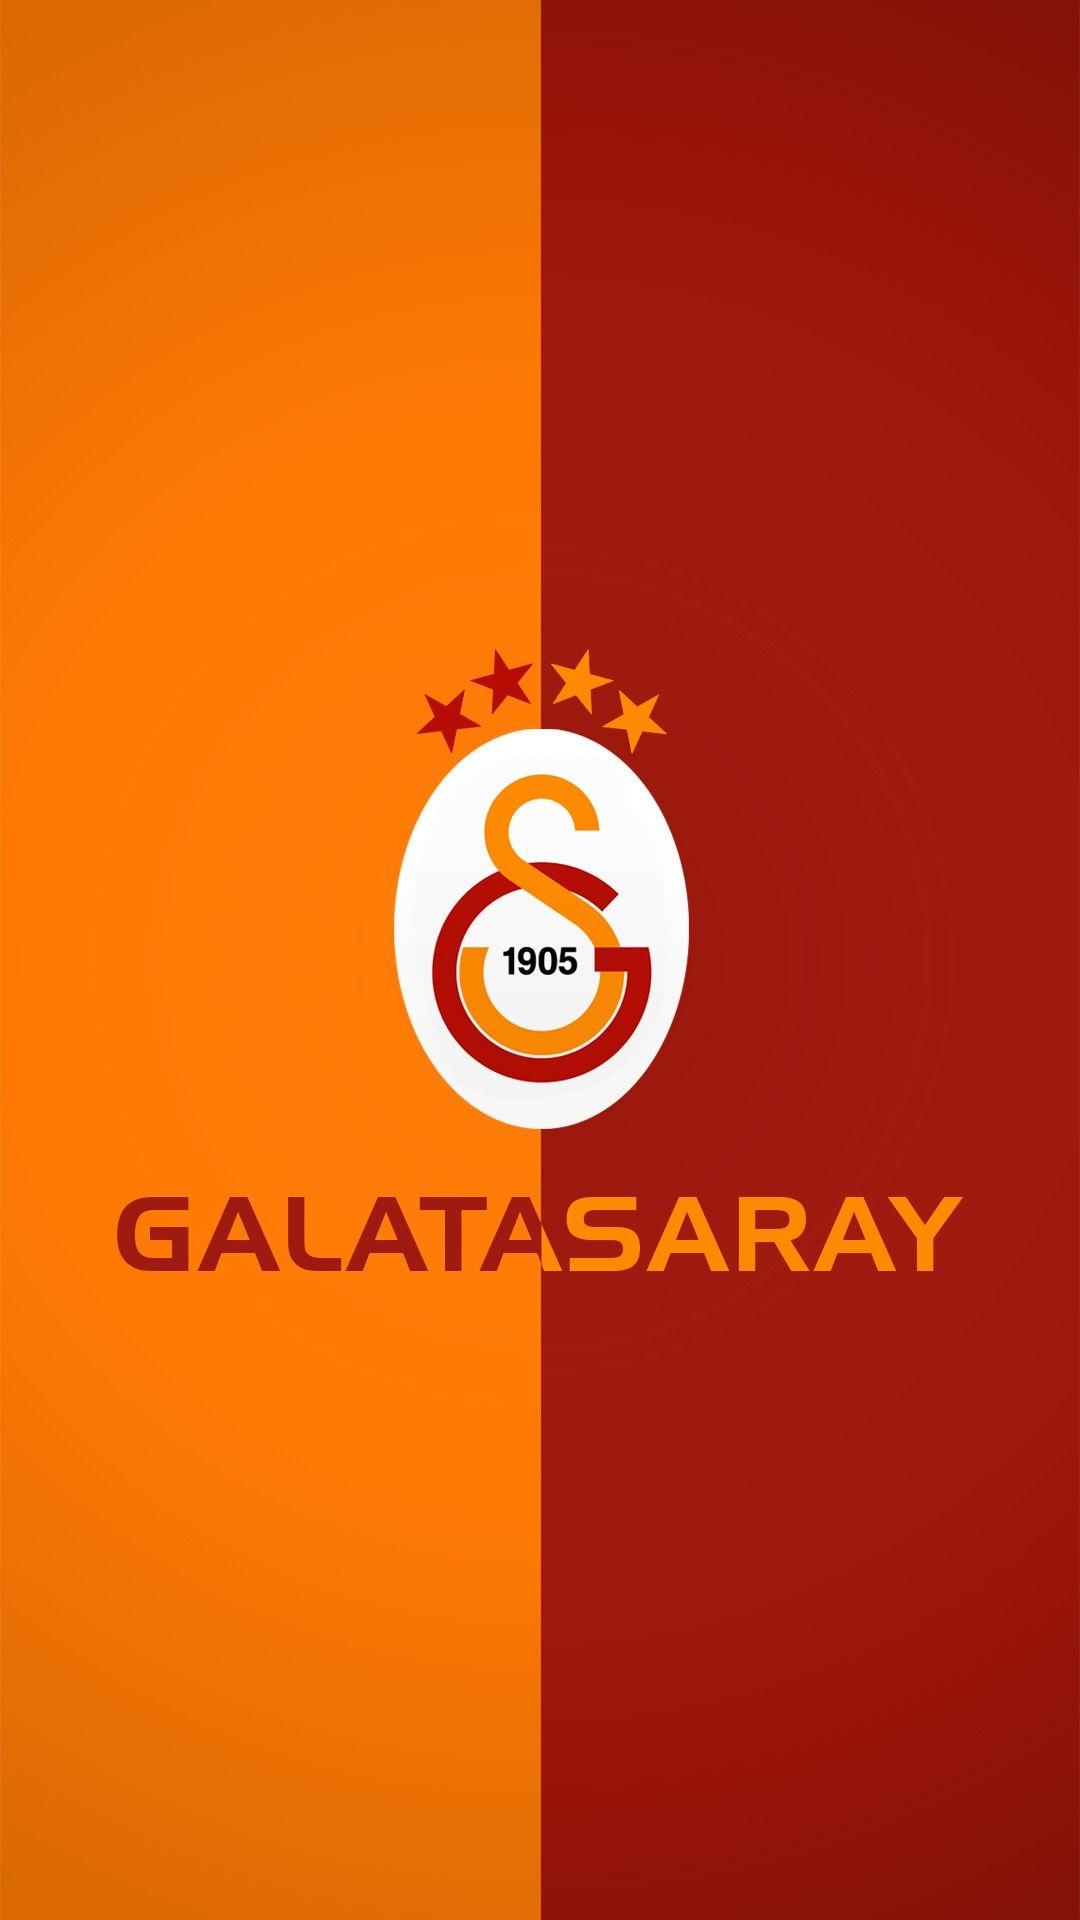 Galatasaray S.K., Soccer Wallpapers HD / Desktop and Mobile | Cimbom Galatasaray | Pinterest